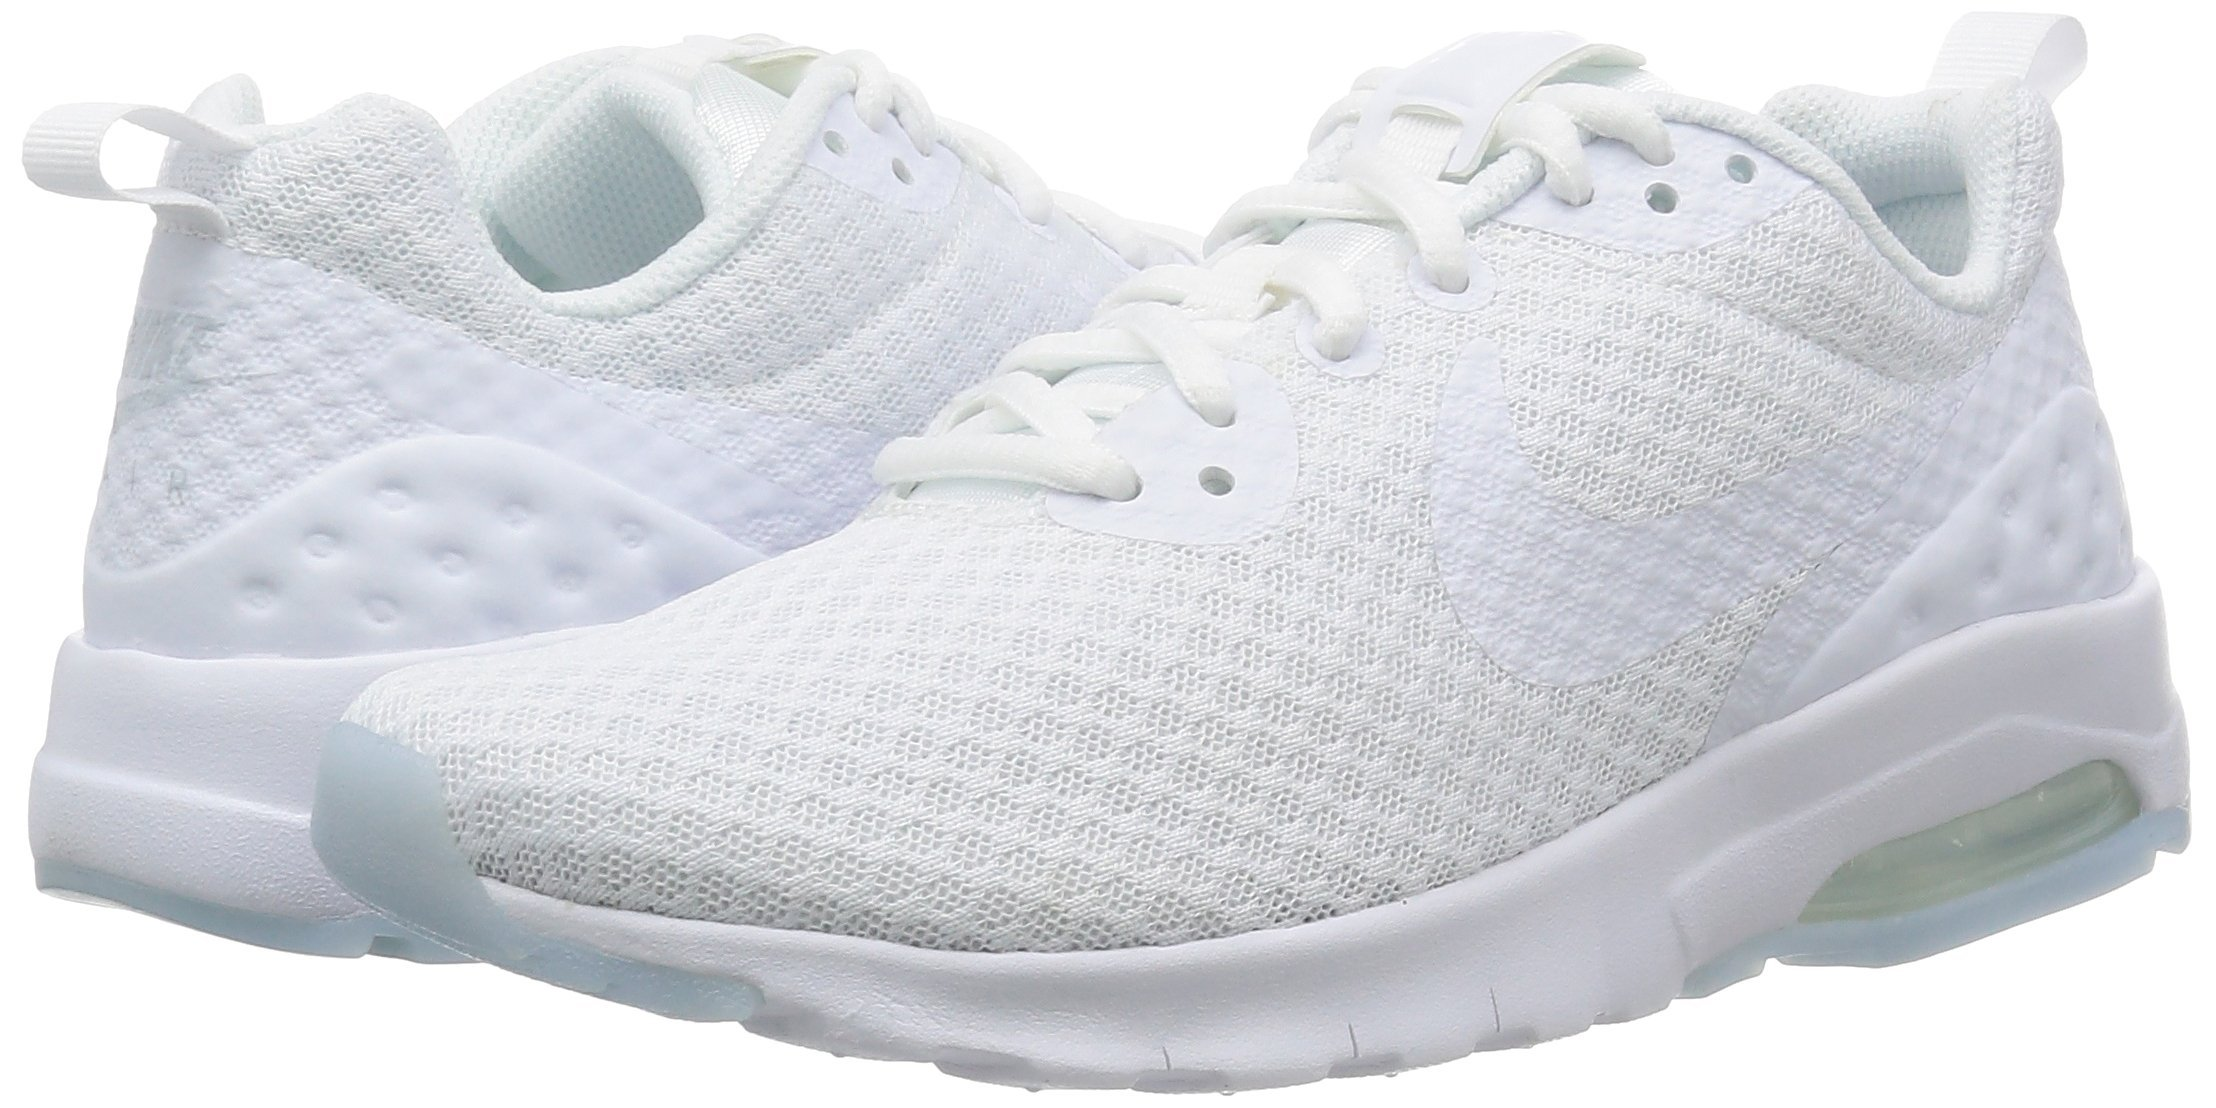 NIKE Women's Air Max Motion LW Running Shoe, White/White, 8.5 M US by NIKE (Image #5)